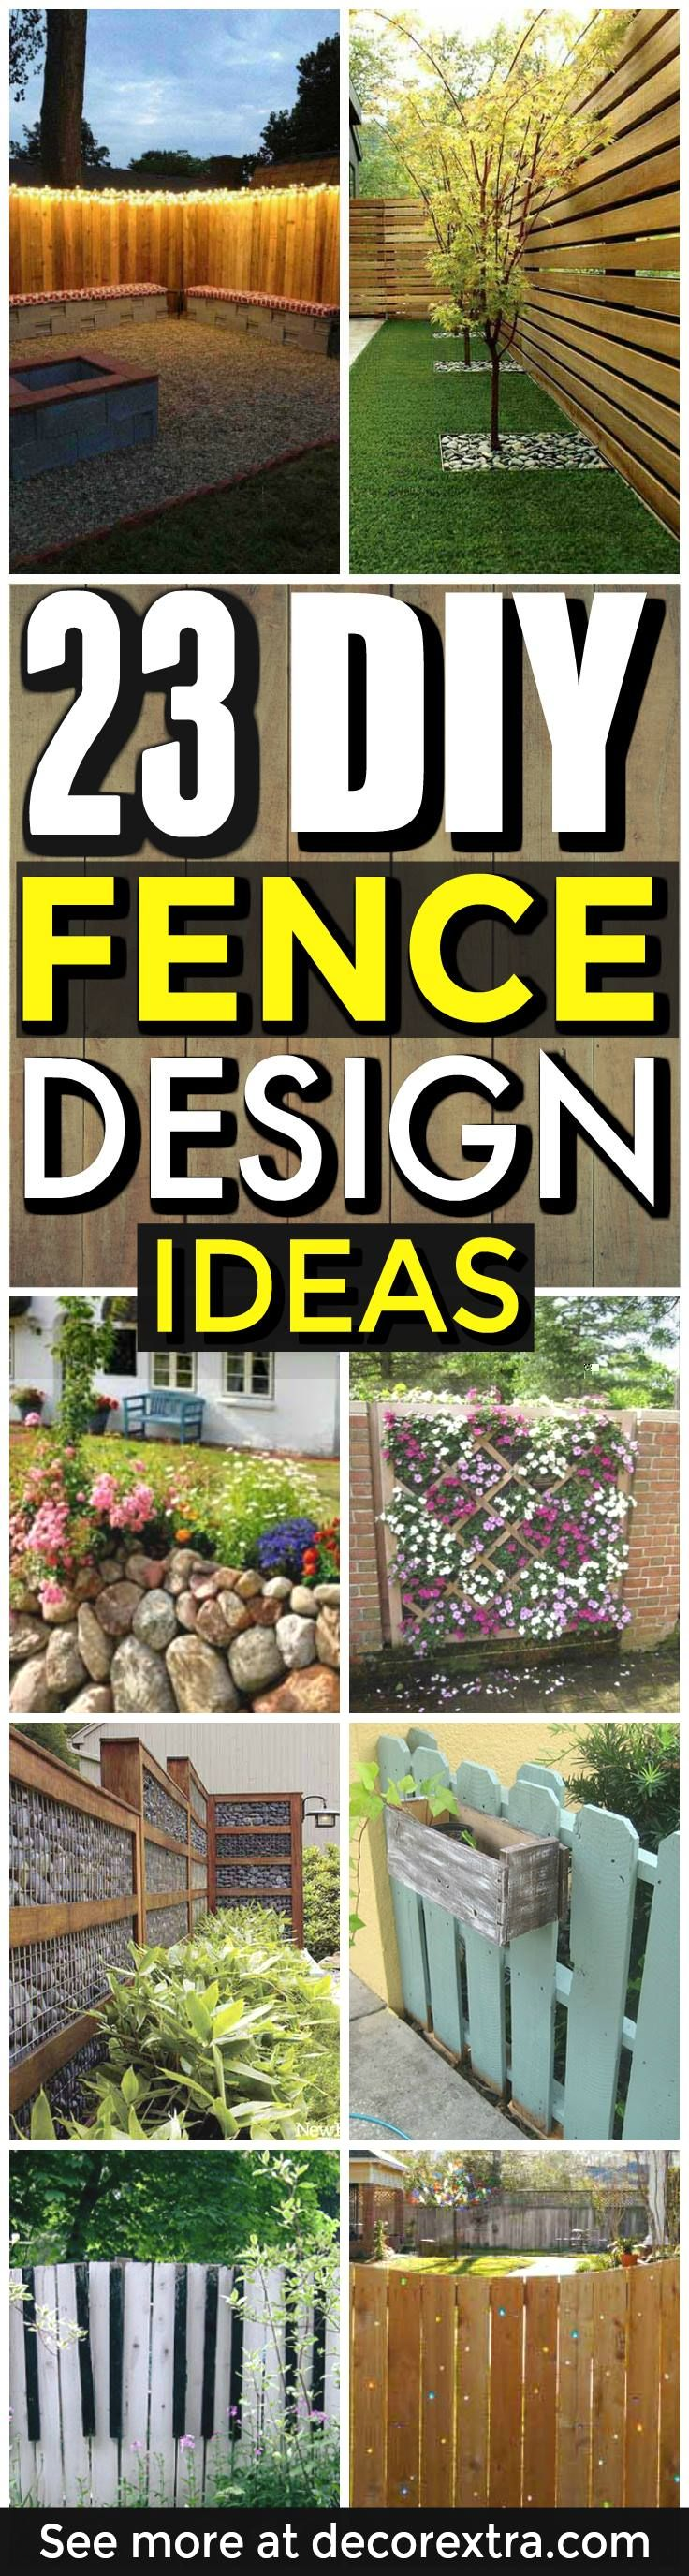 DIY Fence Ideas, Cheap fence ideas - DIY Backyard fence, Outdoor fence designs - DIY Projects